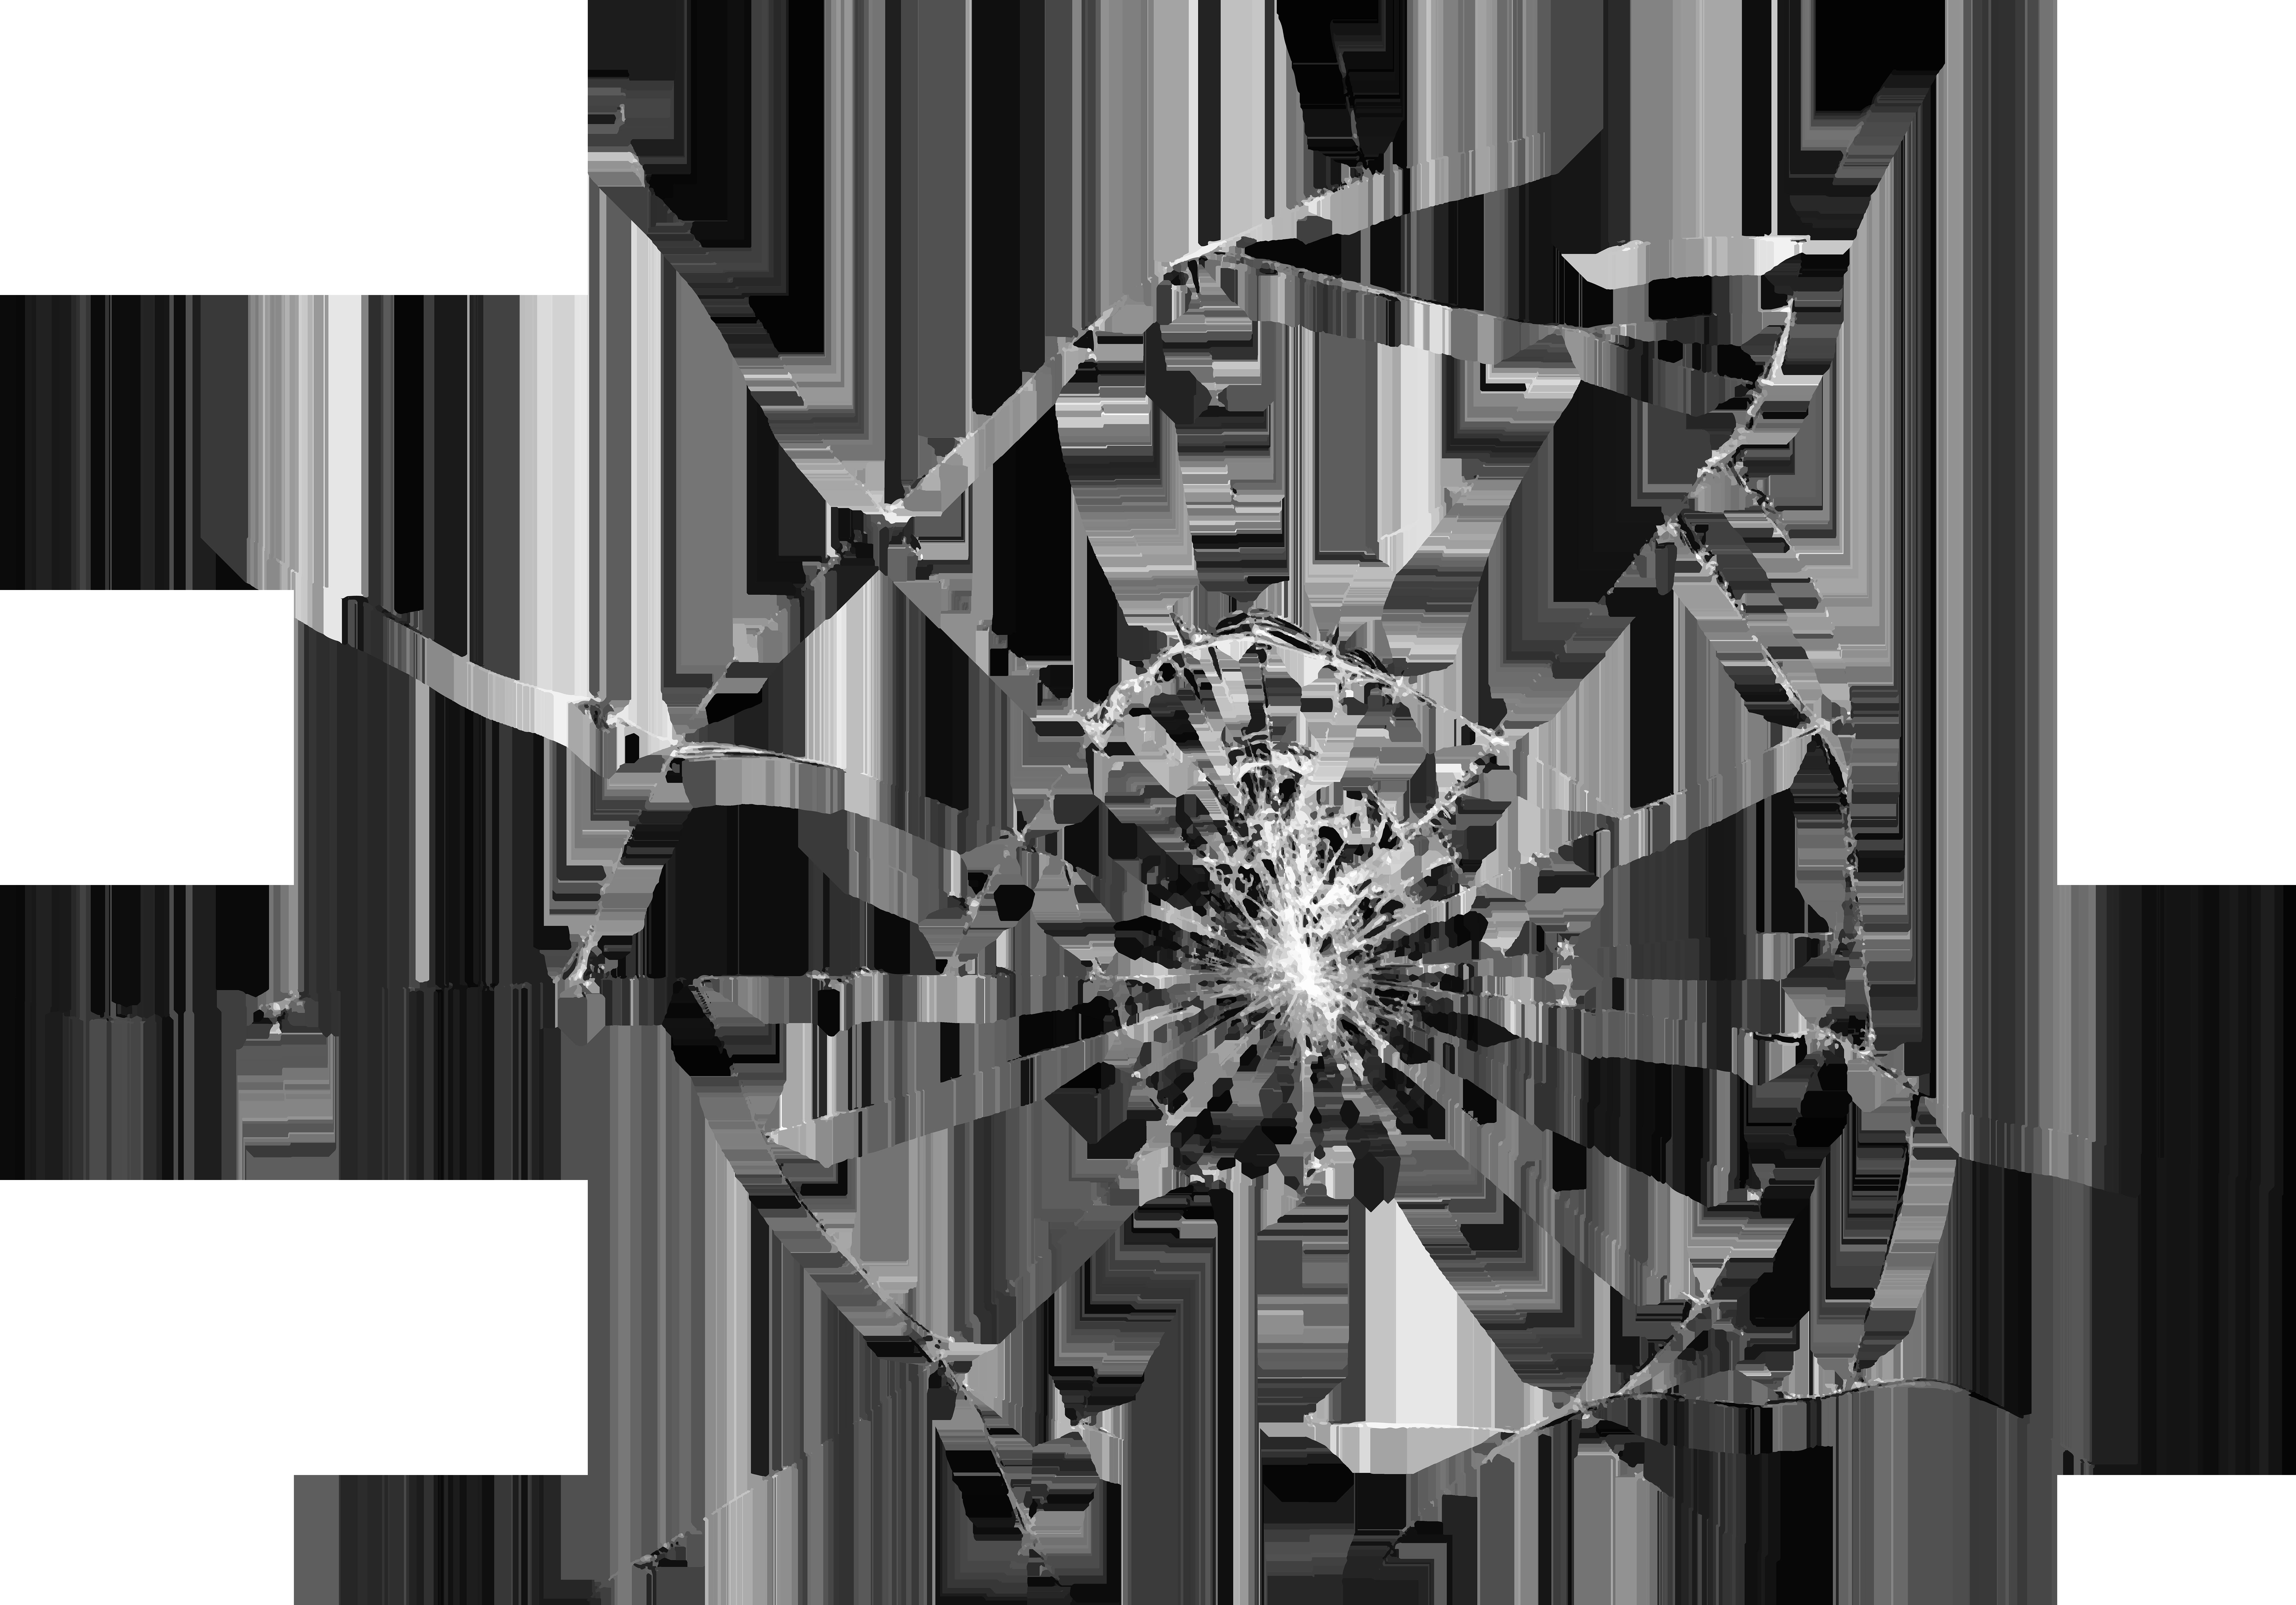 Broken Glass Effect Transparent PNG Clip Art Image.